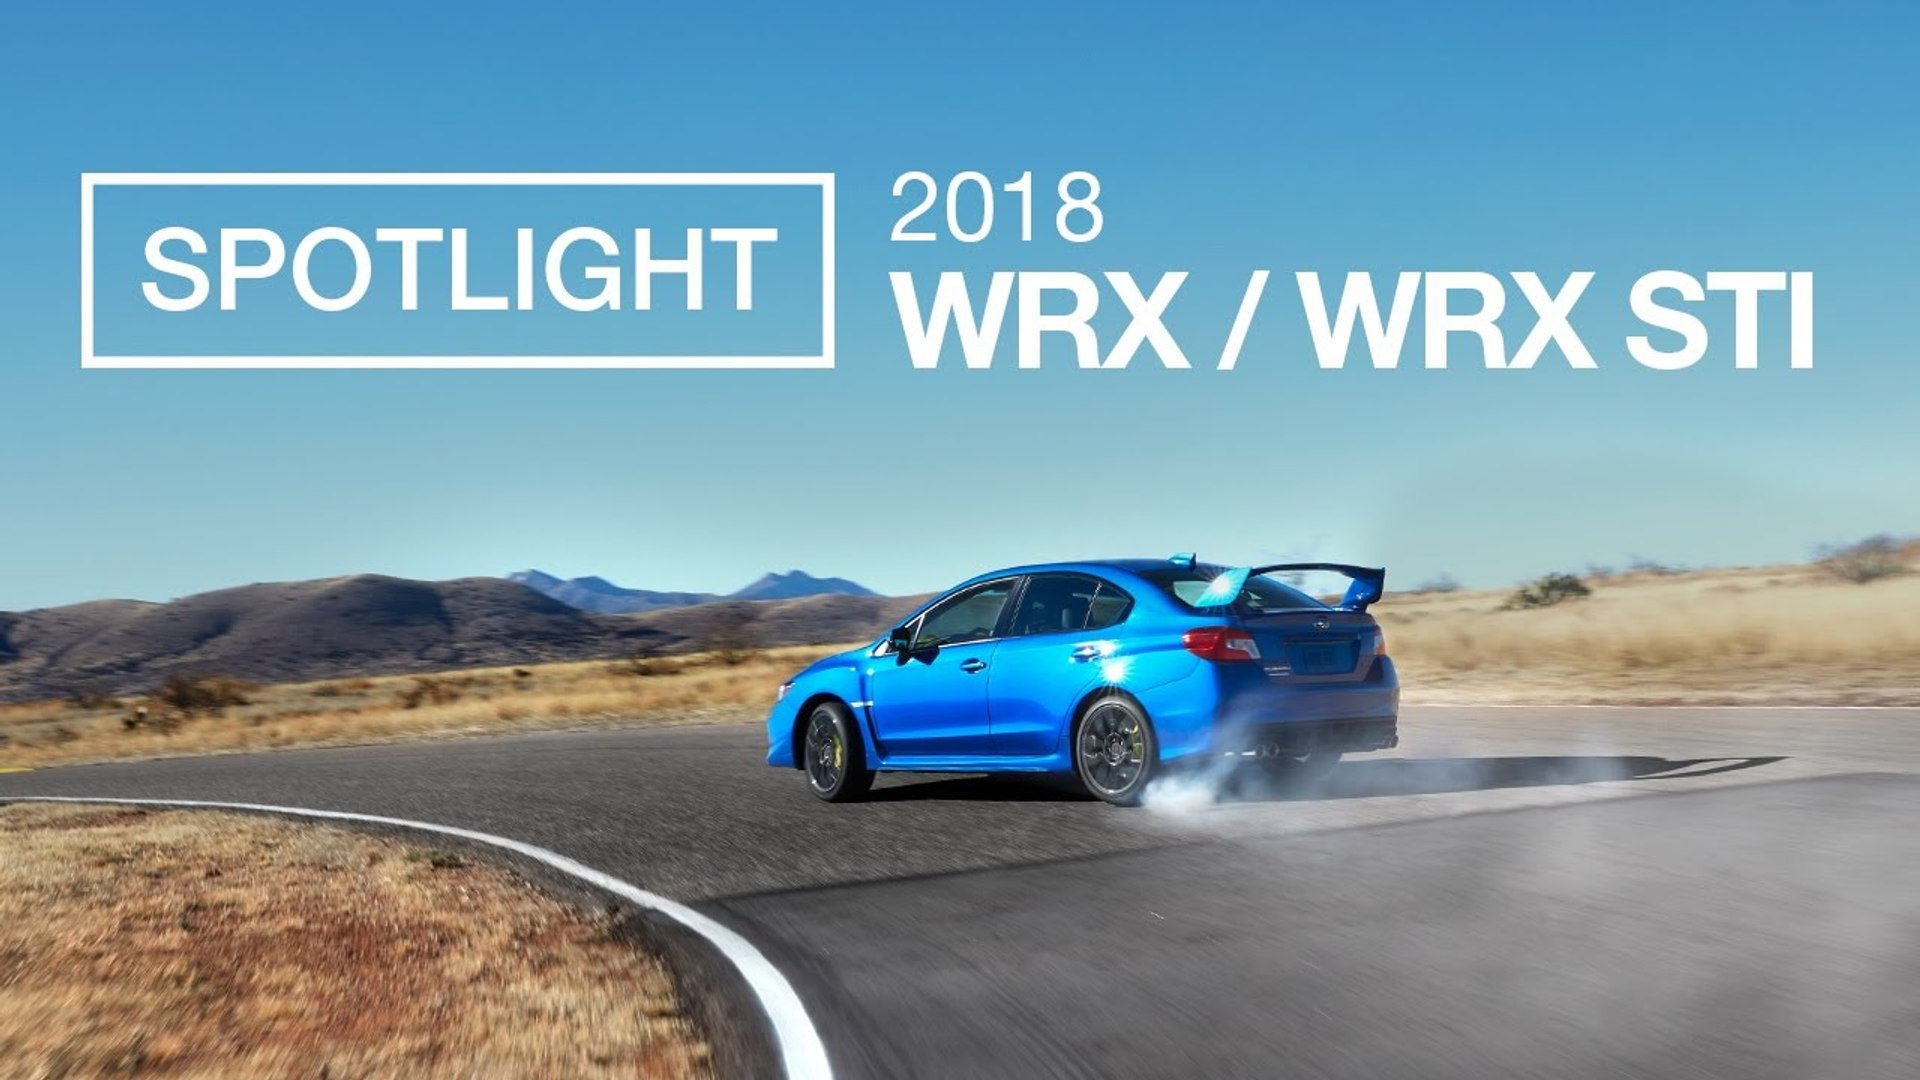 The New 2018 Subaru WRX and WRX STI - Spotlight